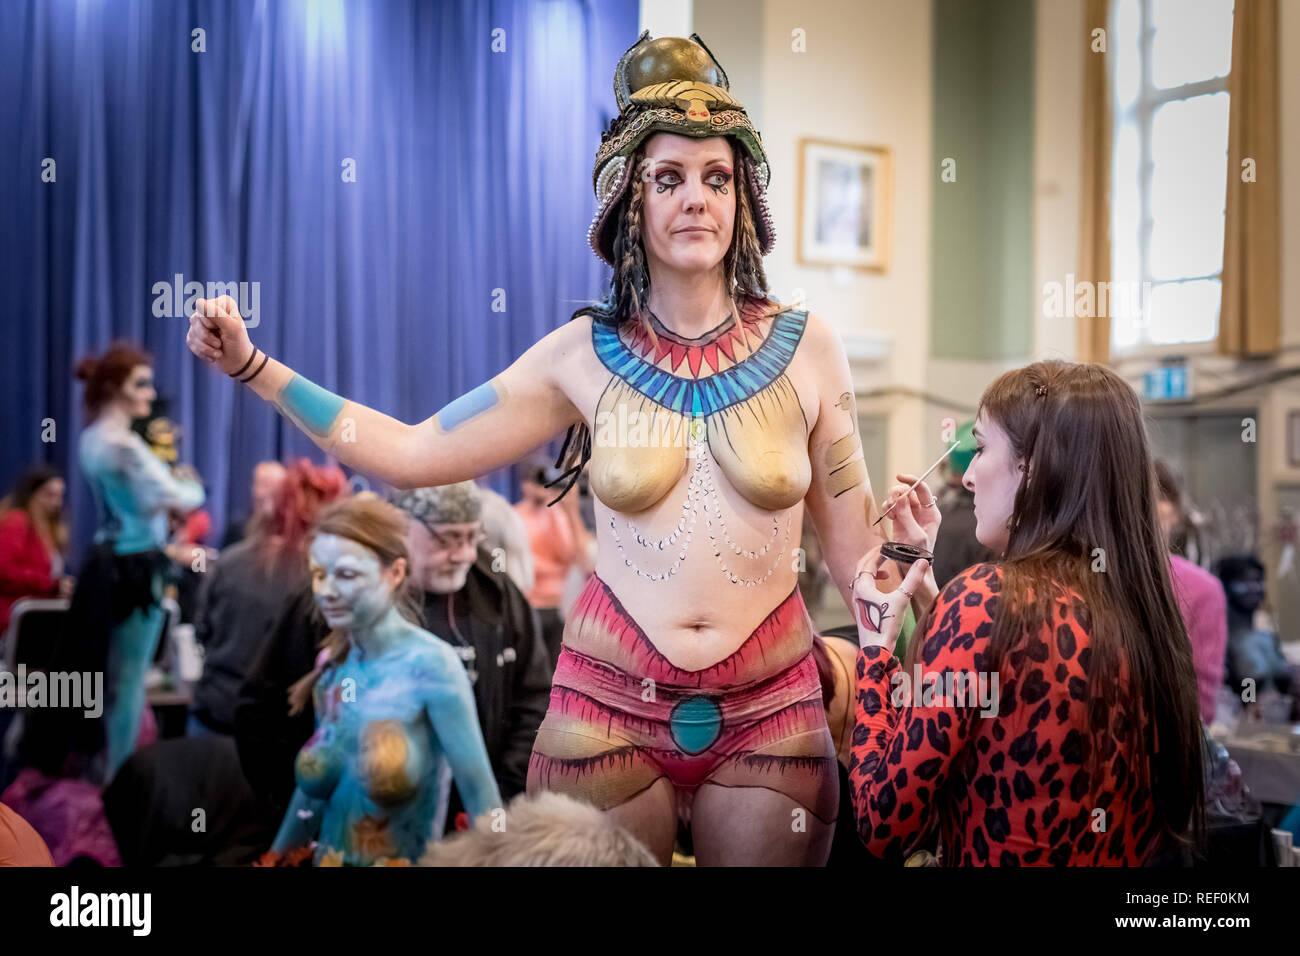 Glastonbury, Somerset, Royaume-Uni. 12Th jan 2019. Glastonbury Festival d'art de corps. Crédit: Guy Josse/Alamy Live News Photo Stock